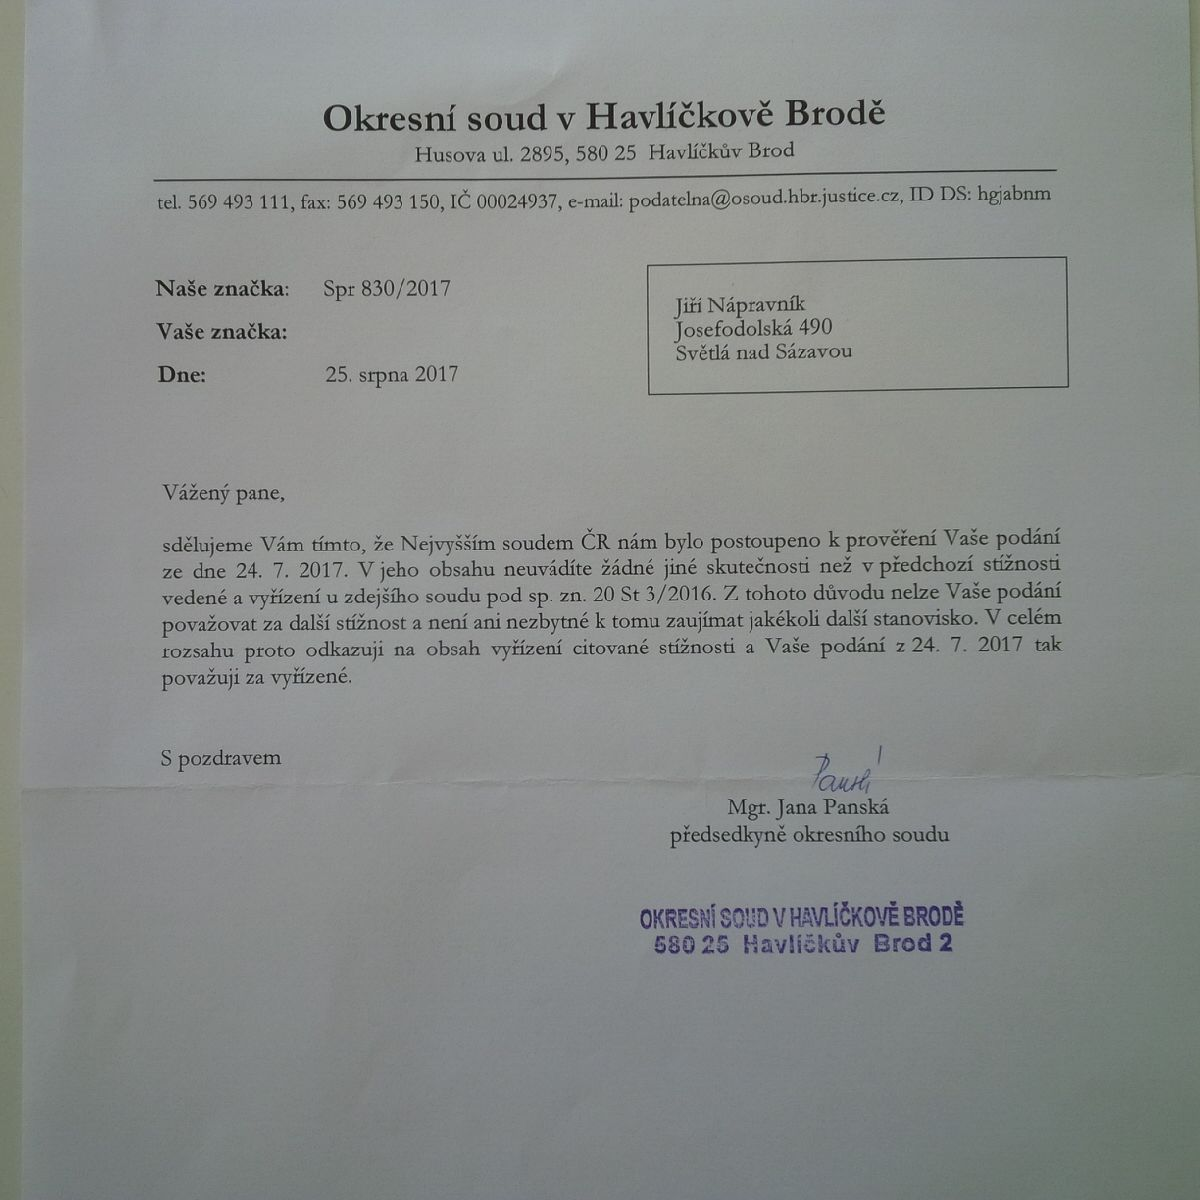 OS HB Napravnik 250817